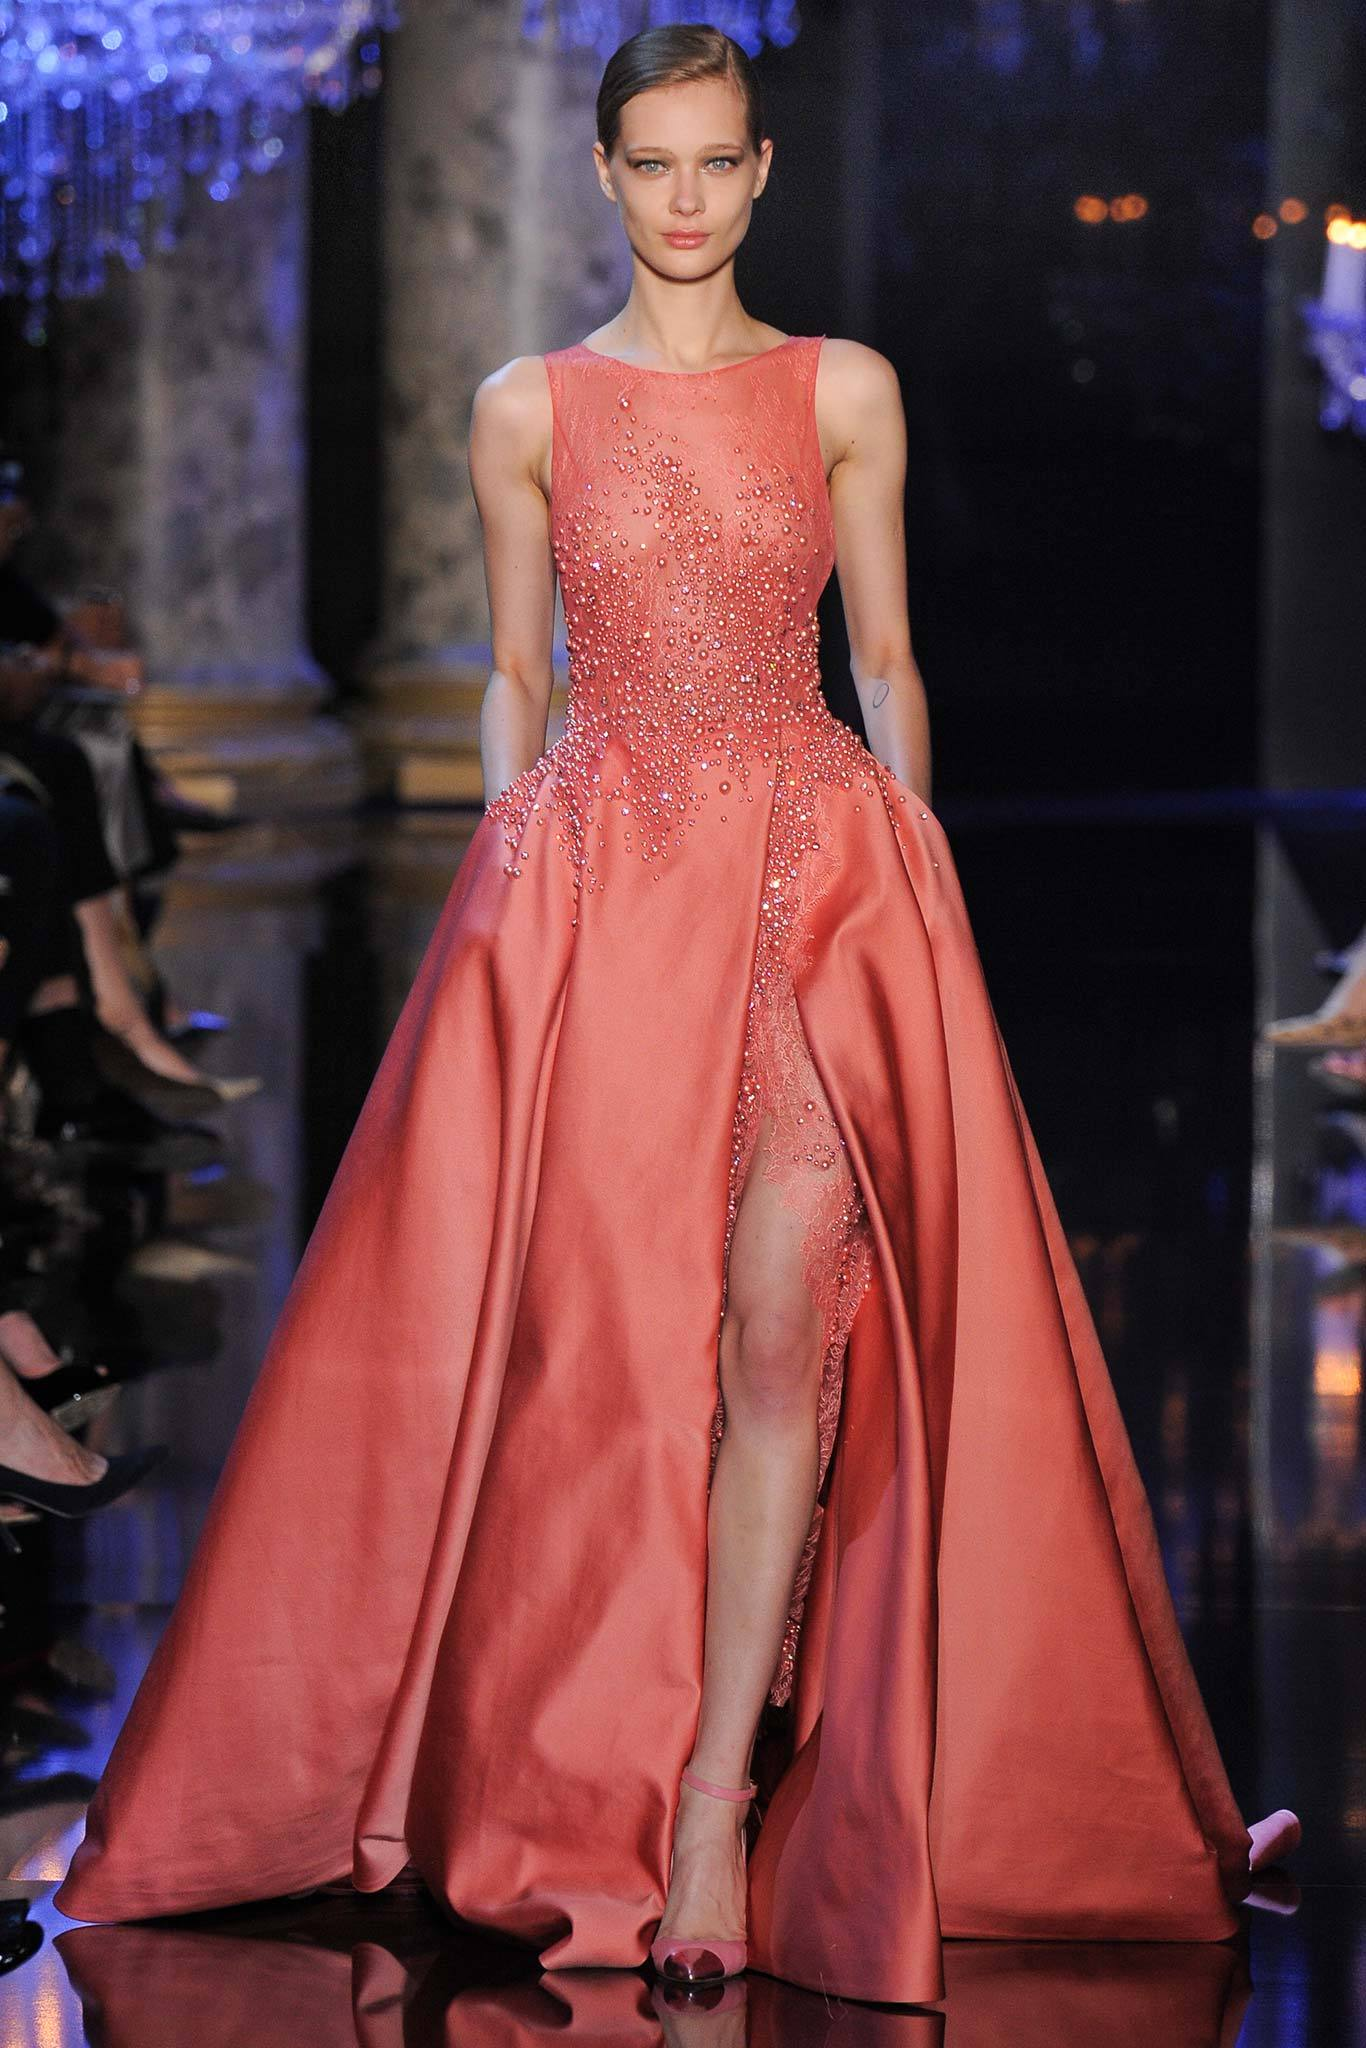 Elie-Saab-Couture-Fall2014-07.JPG